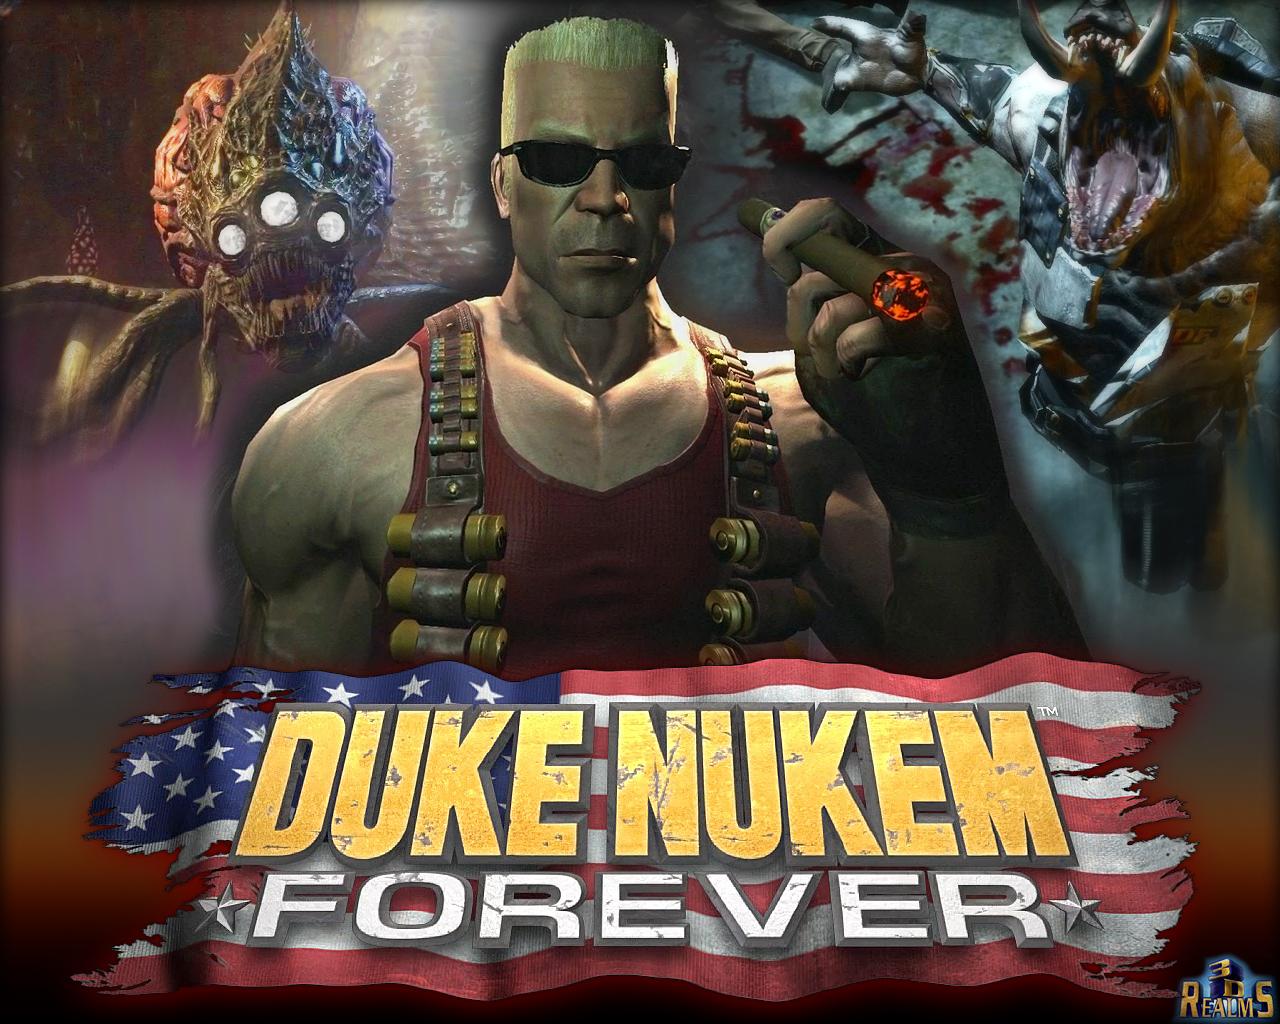 http://4.bp.blogspot.com/-YSYDW5kGxFs/Tfda3hgFpcI/AAAAAAAADjw/tz-6ABmH44s/s1600/duke-nukem-forever-logo-wallpaper.jpg